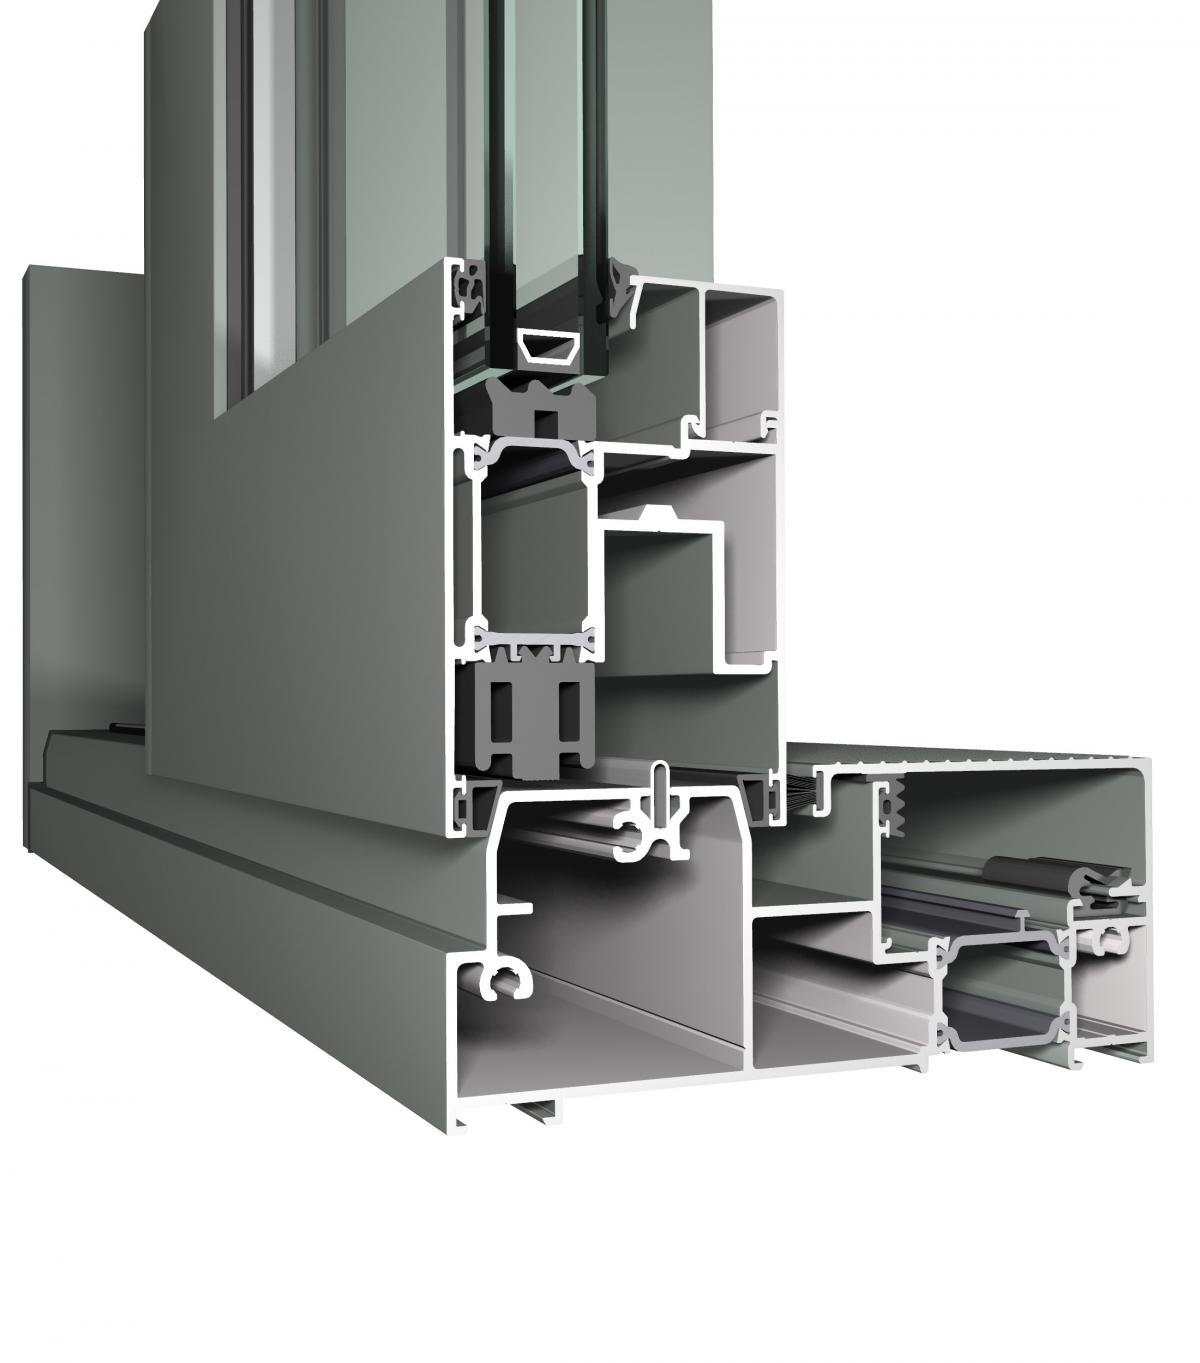 Aluminium Doors Product : Aluminium products dg windows